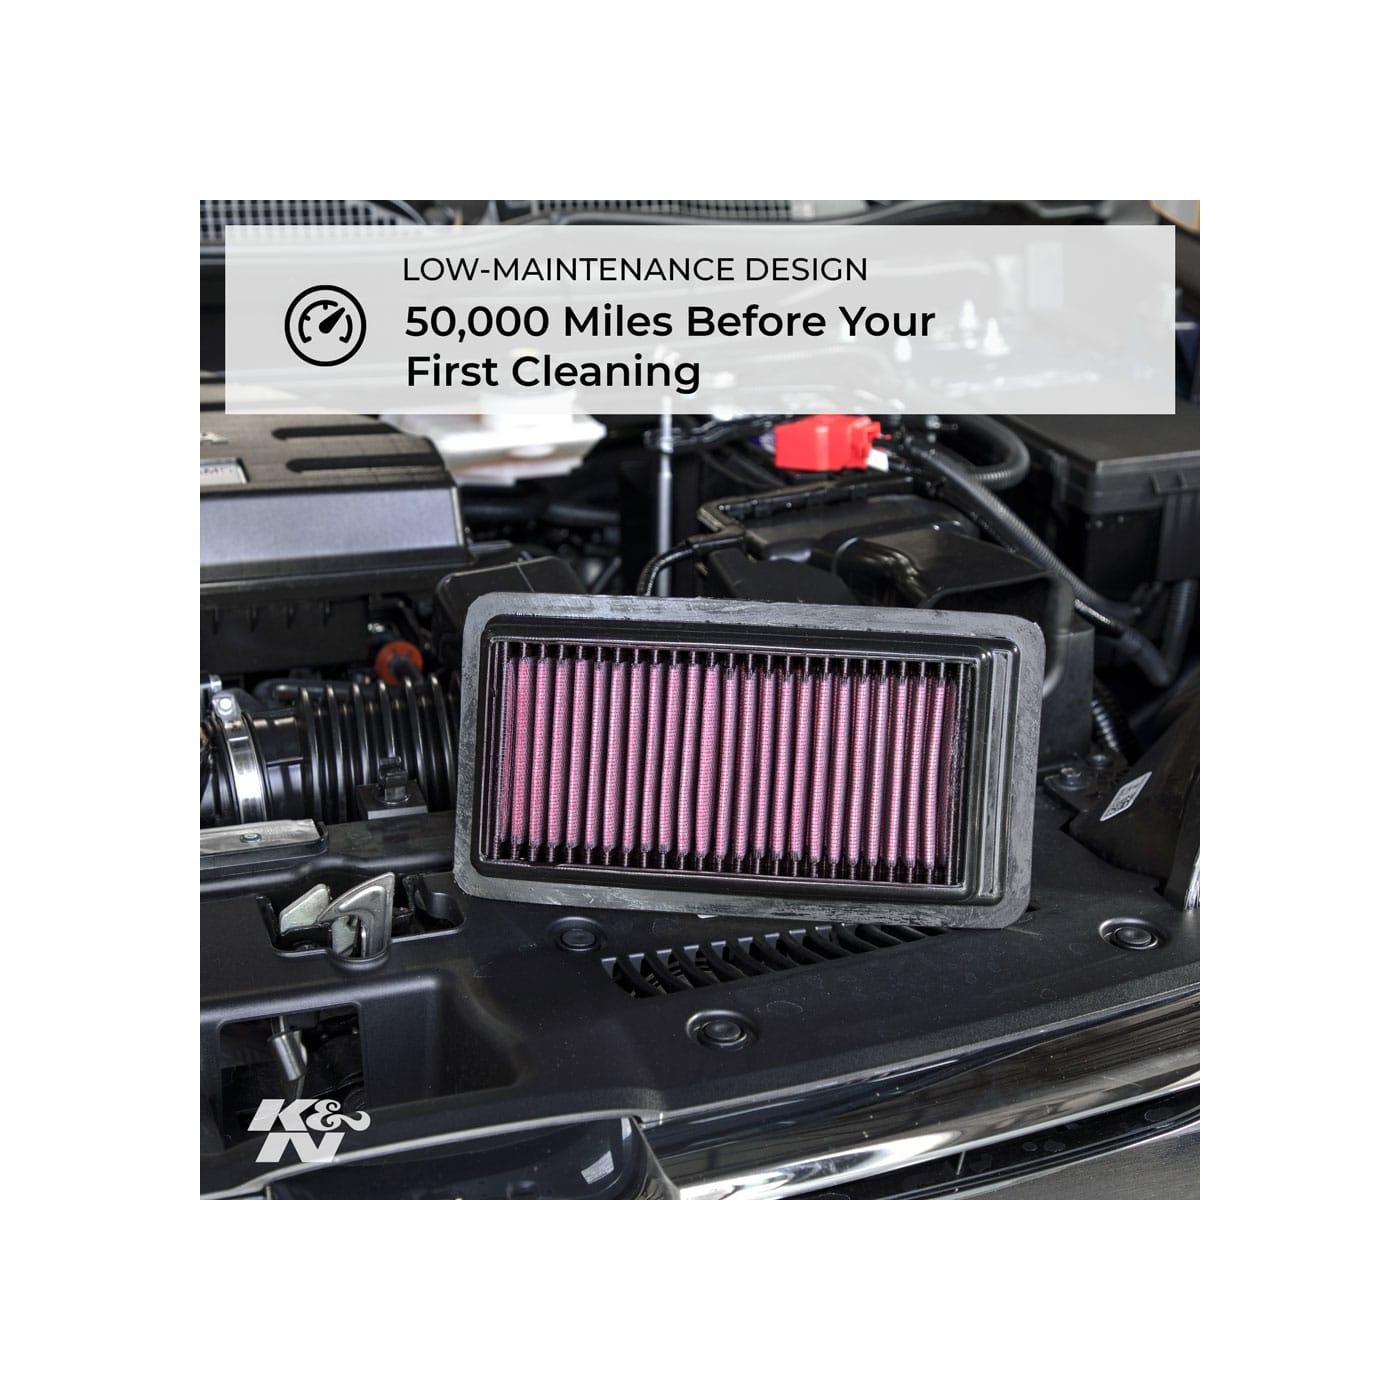 Filtro De Ar 33-2031-2 Infiniti QX60 Nissan Murano Maxima Pathfinder Altima Quest Presage